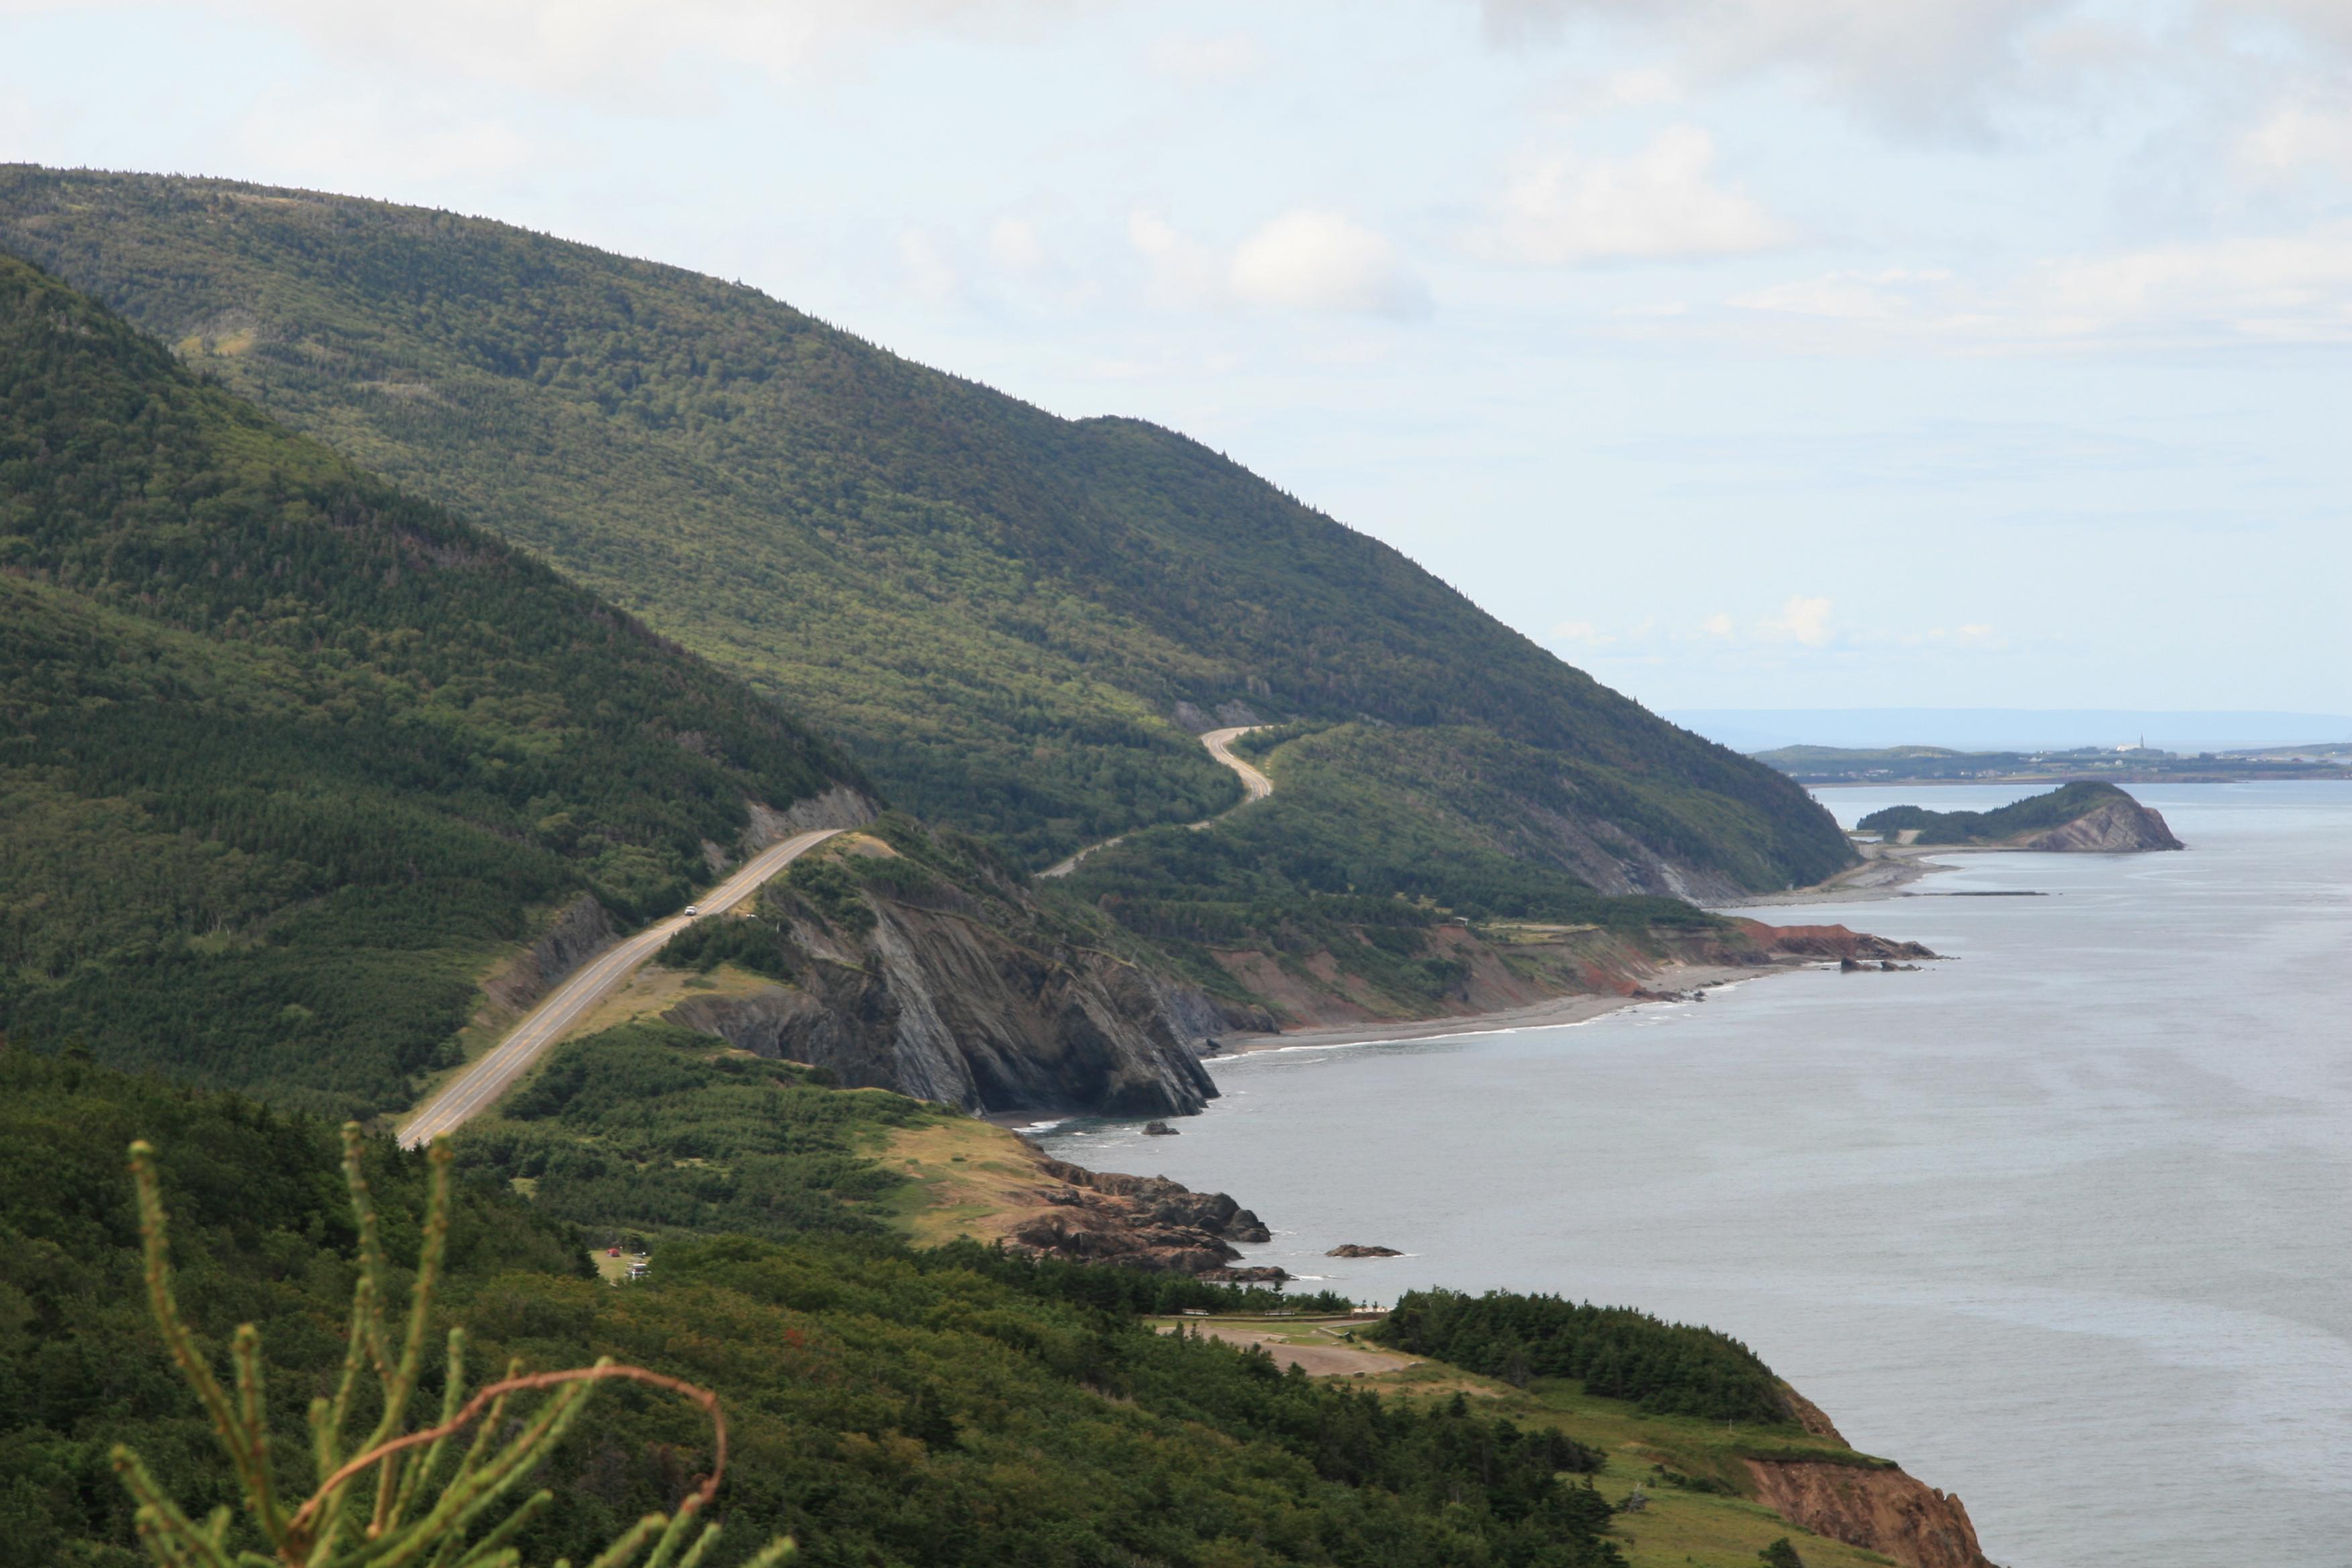 Cape-Breton-Highlands-Nationalpark #